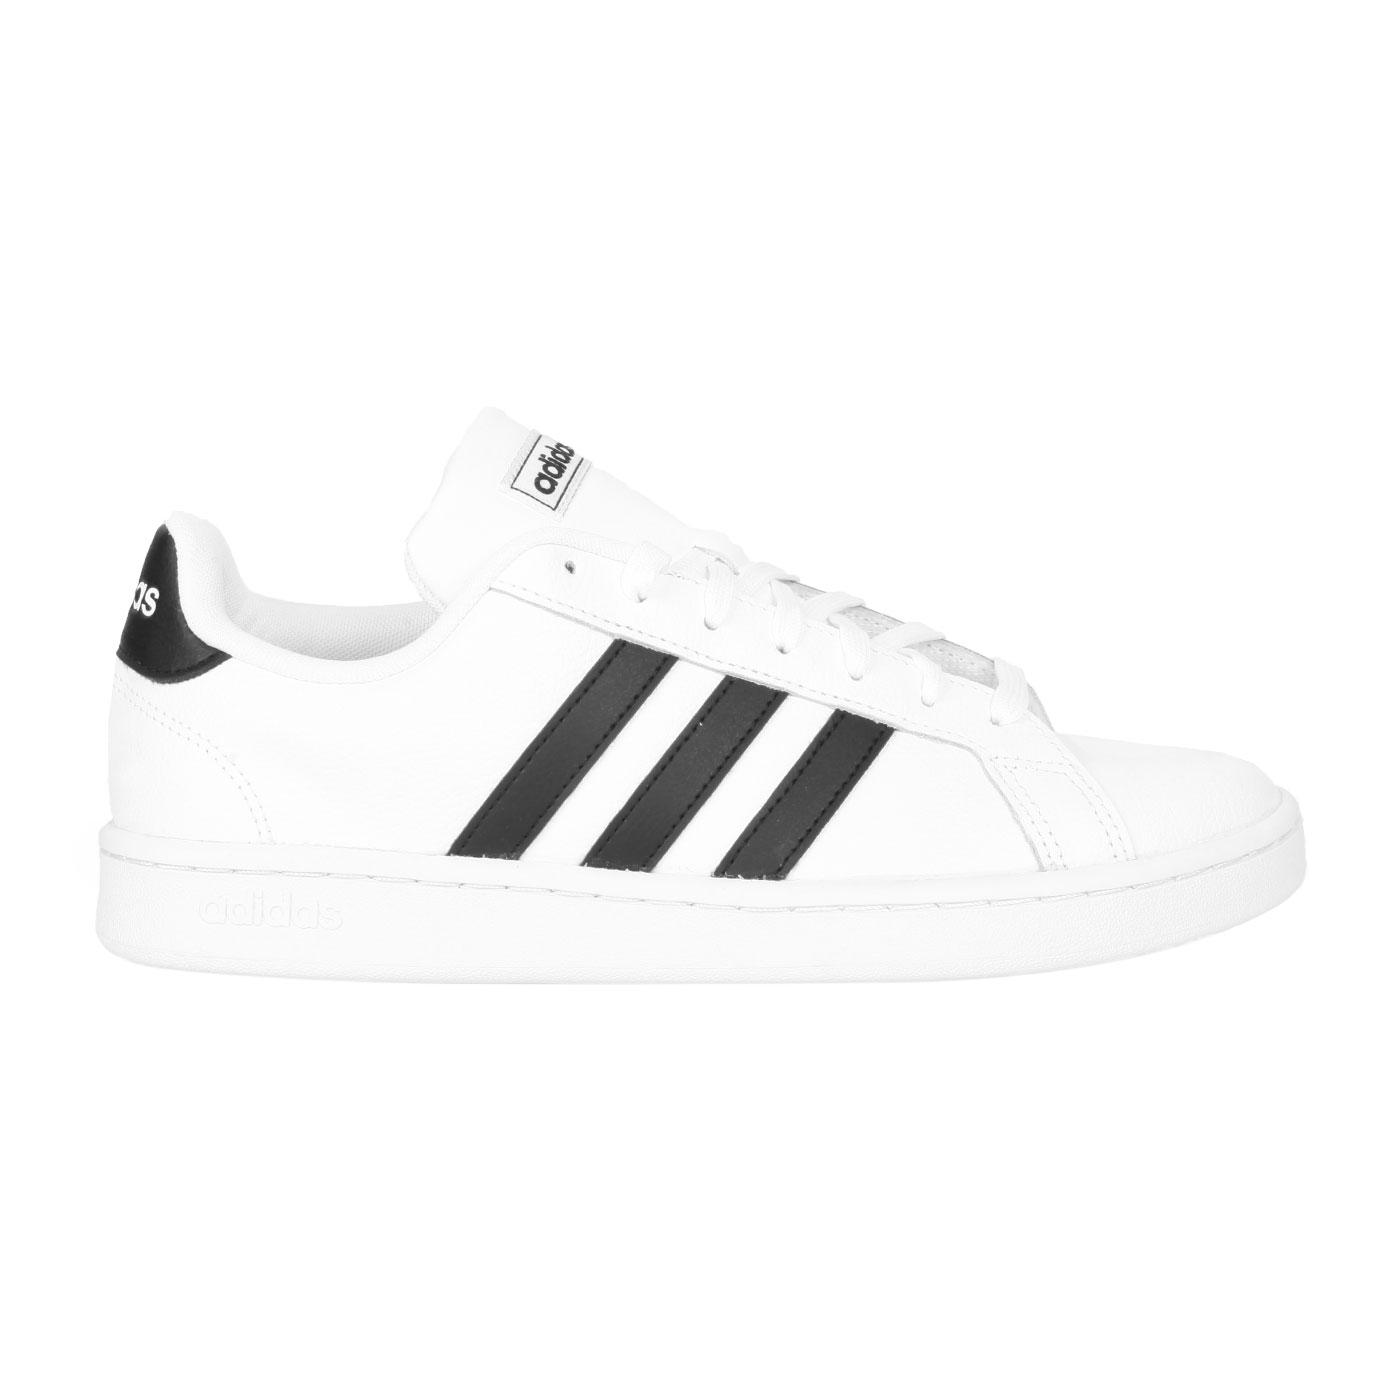 ADIDAS 男款休閒運動鞋  @GRAND COURT@F36392 - 白黑